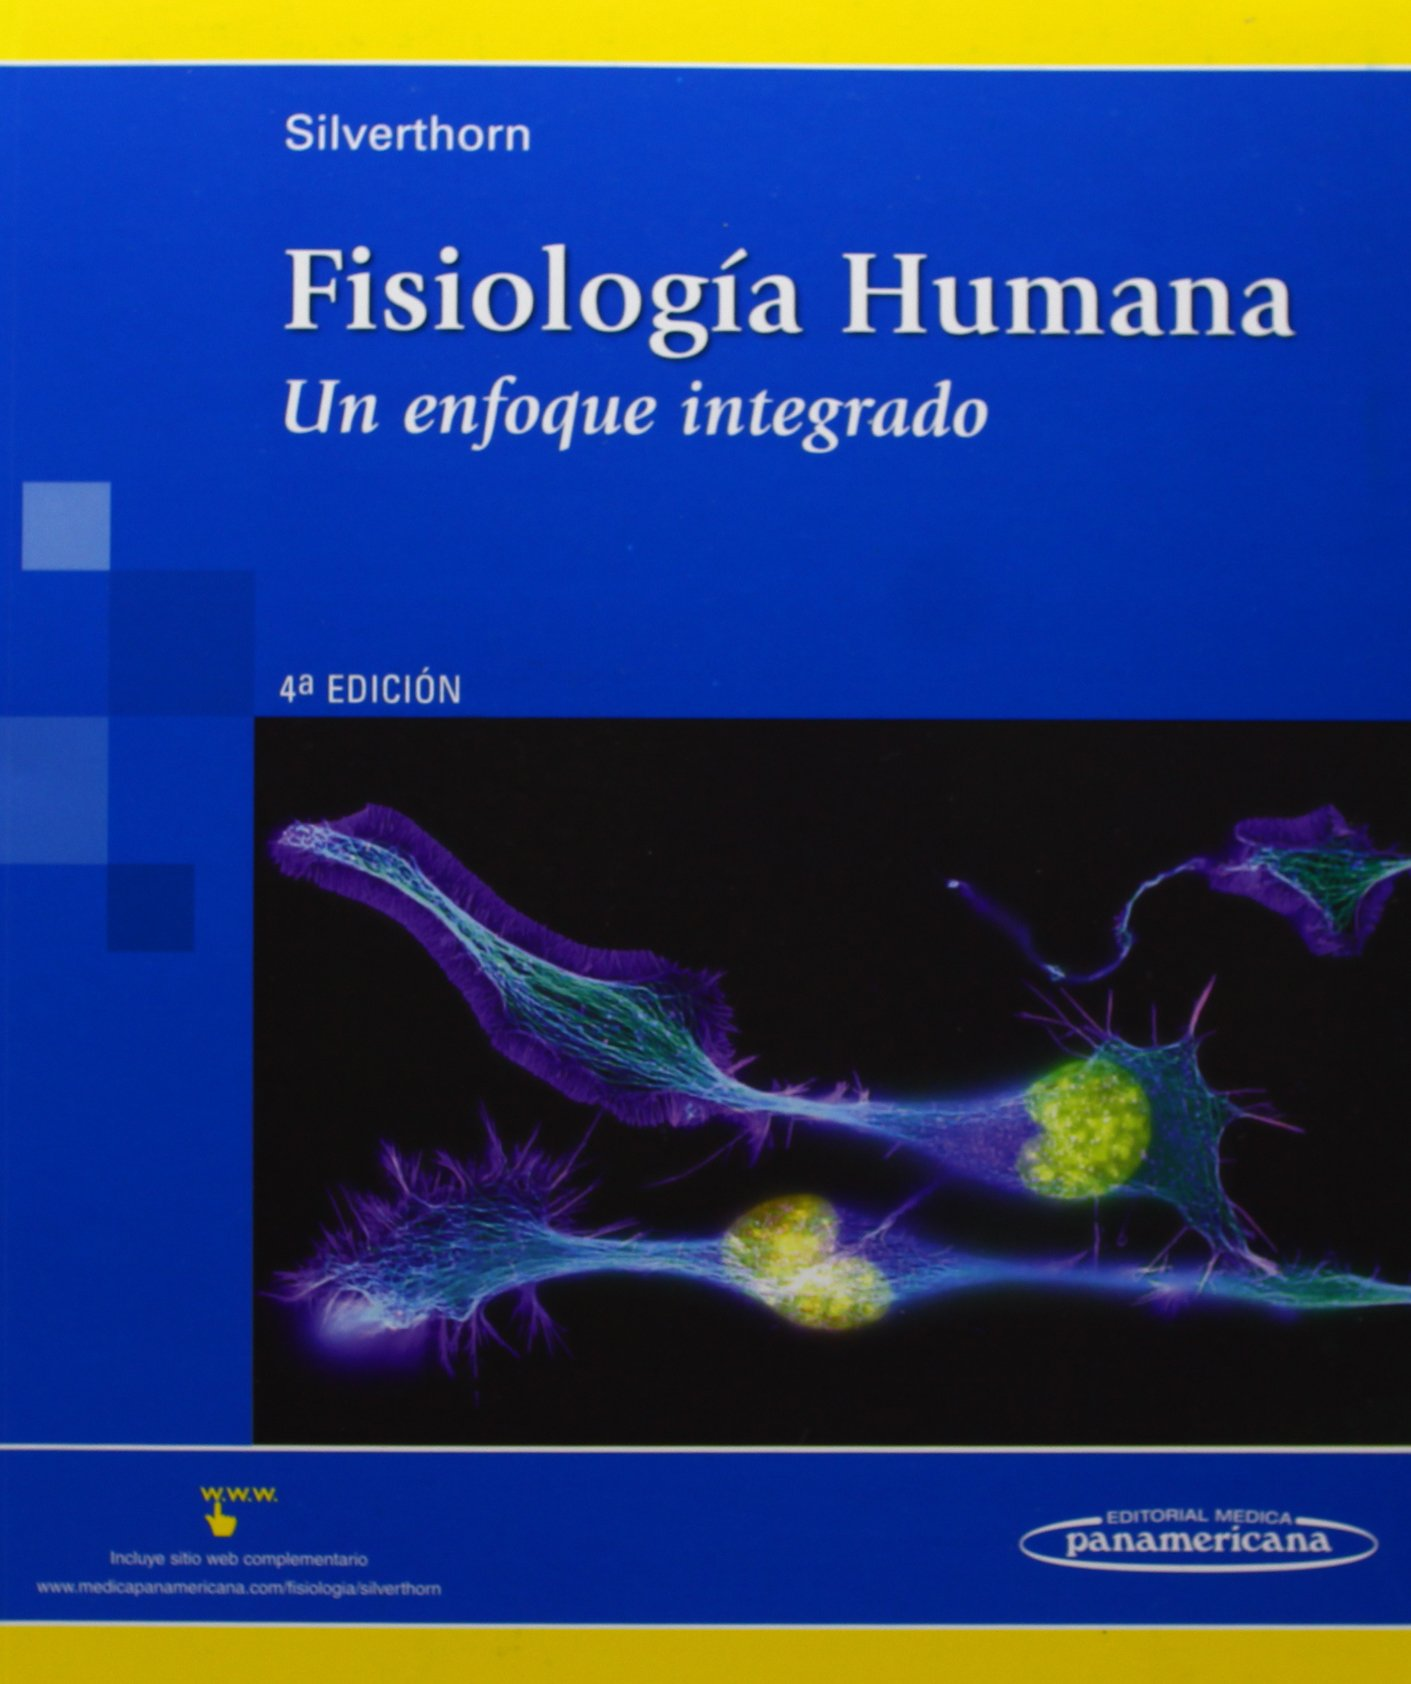 Fisiologia humana, un enfoque integrado: Amazon.es: SILVERTHORN: Libros